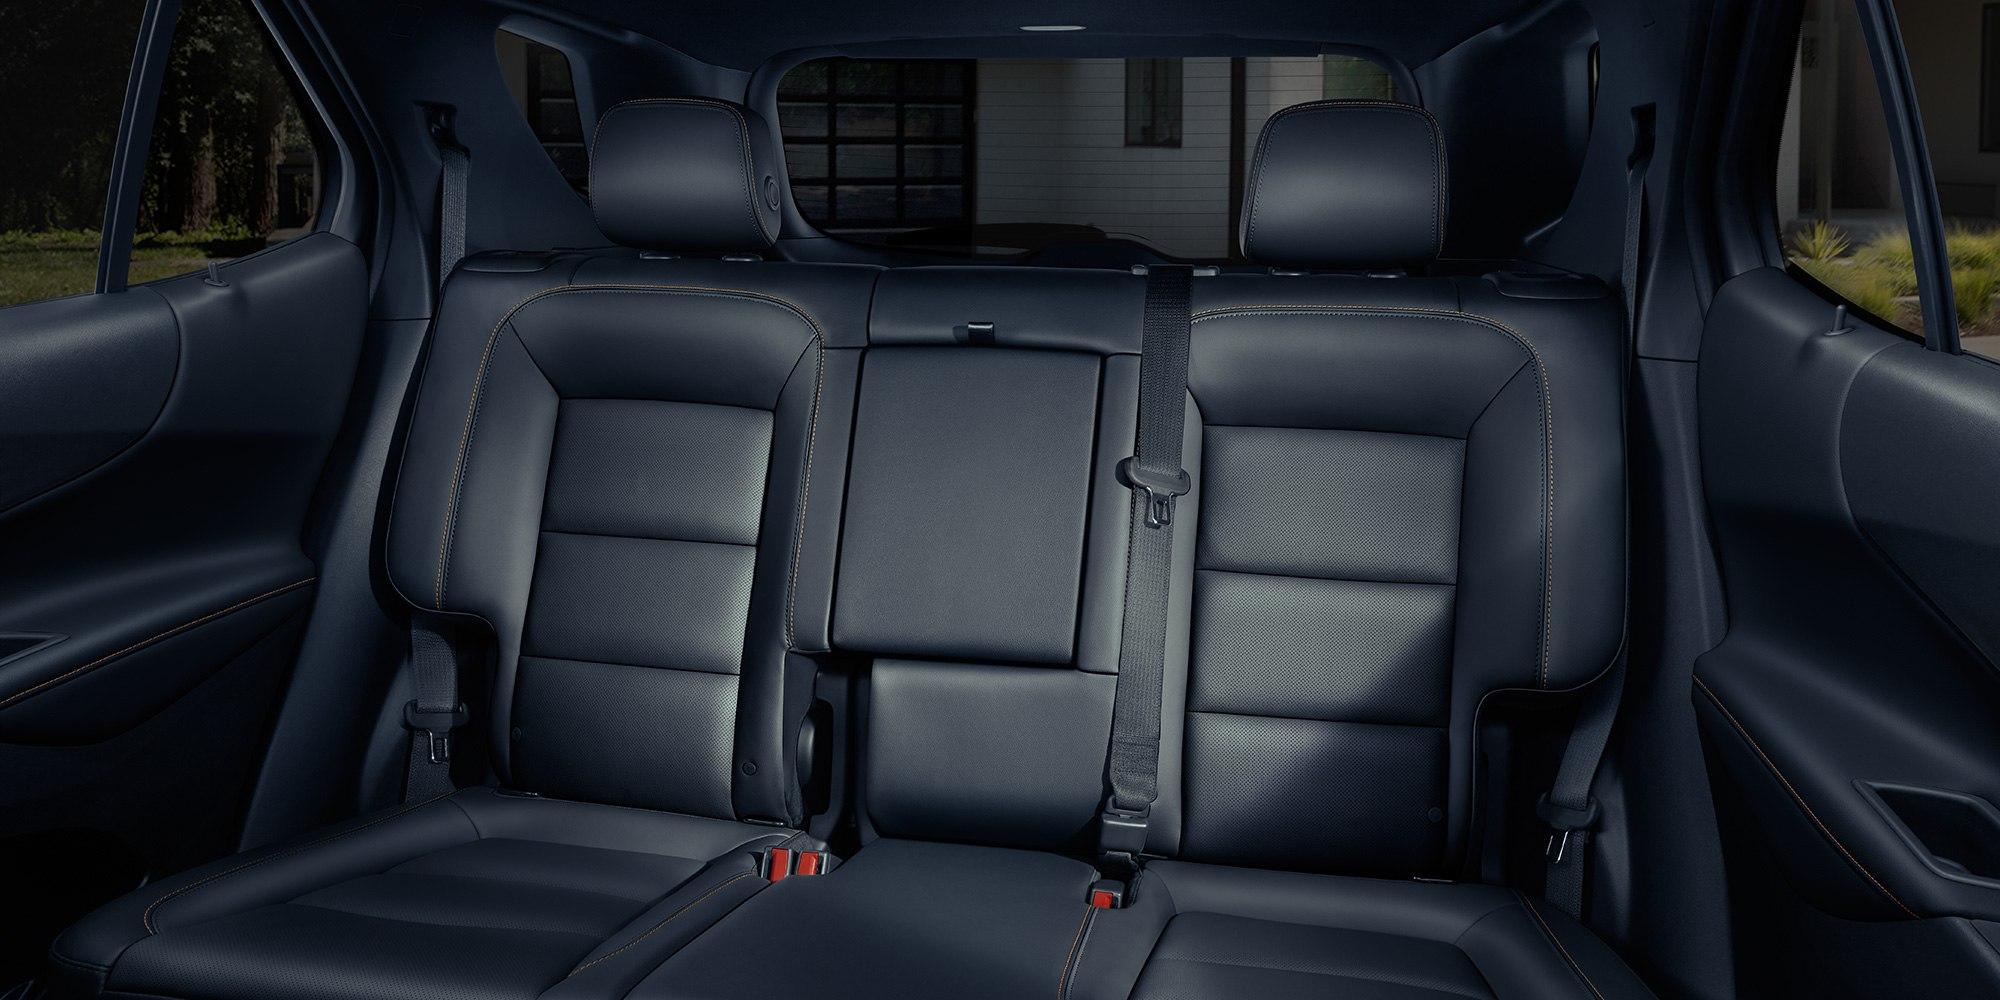 2020 Chevrolet Equinox Rear Seating